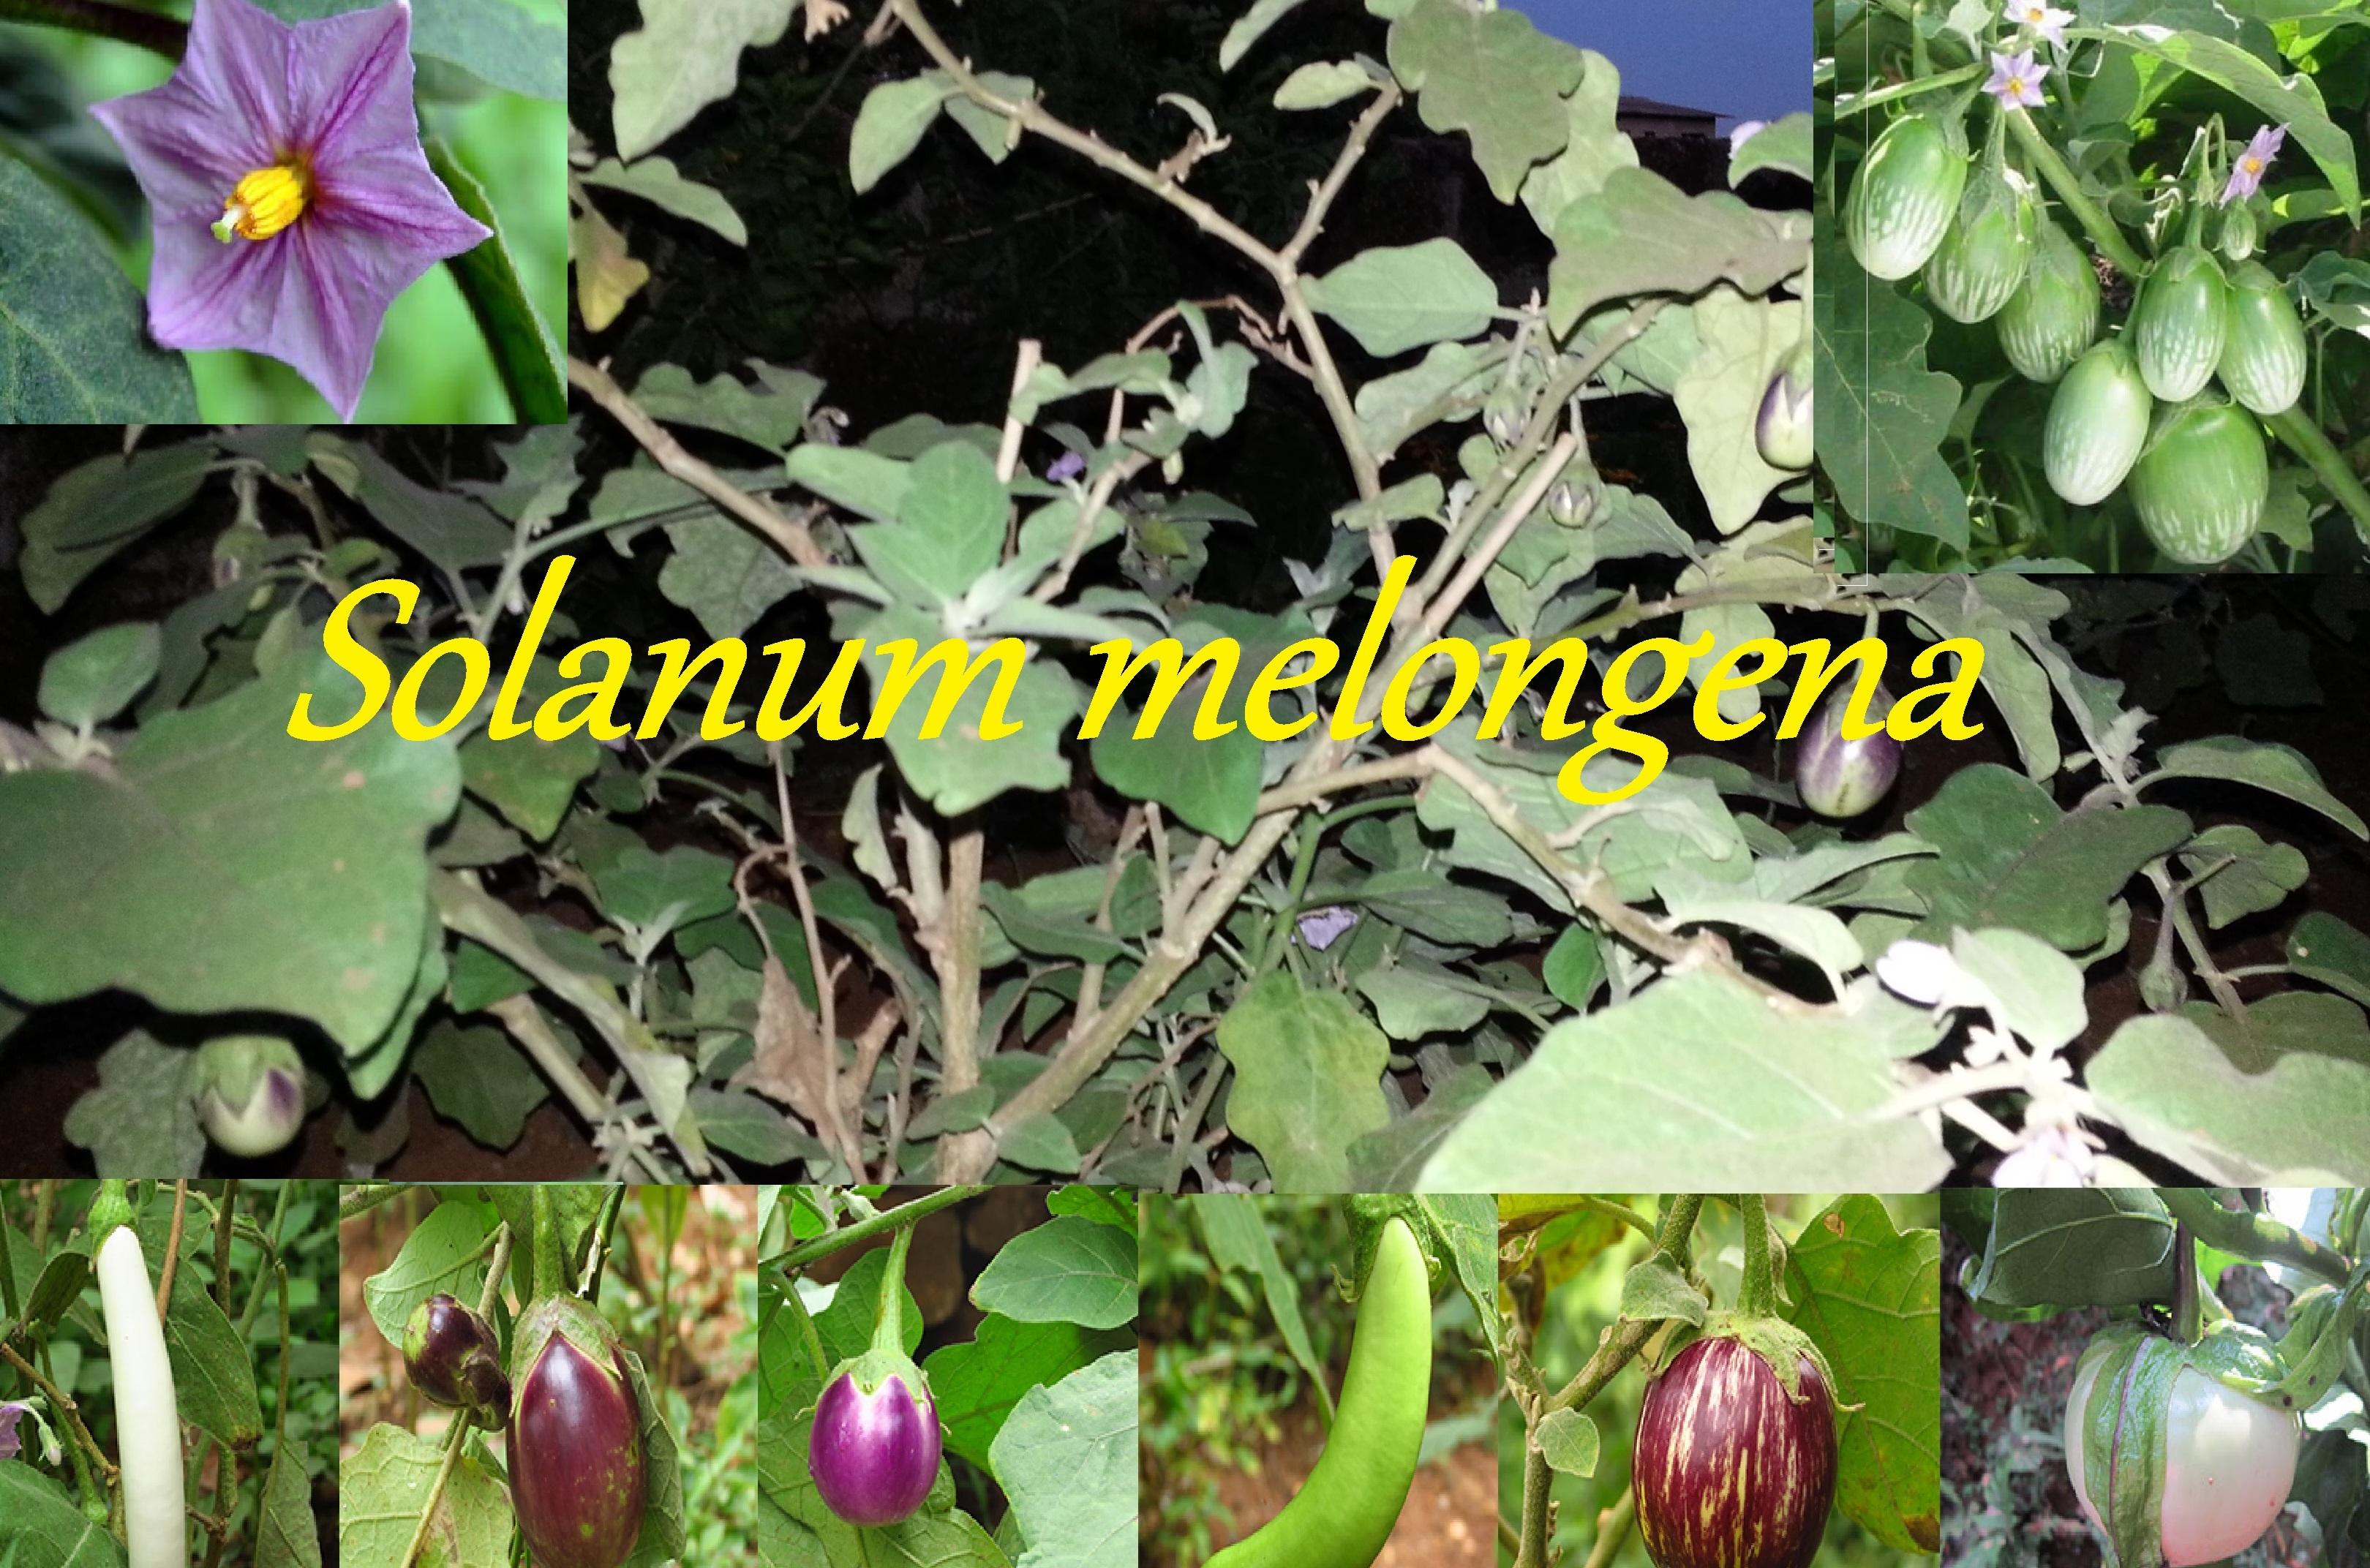 You are currently viewing ಹೇಳೋದು ಆಚಾರ, ತಿನ್ನೋದು ಬದನೆಕಾಯಿ: (Solanum melongena)